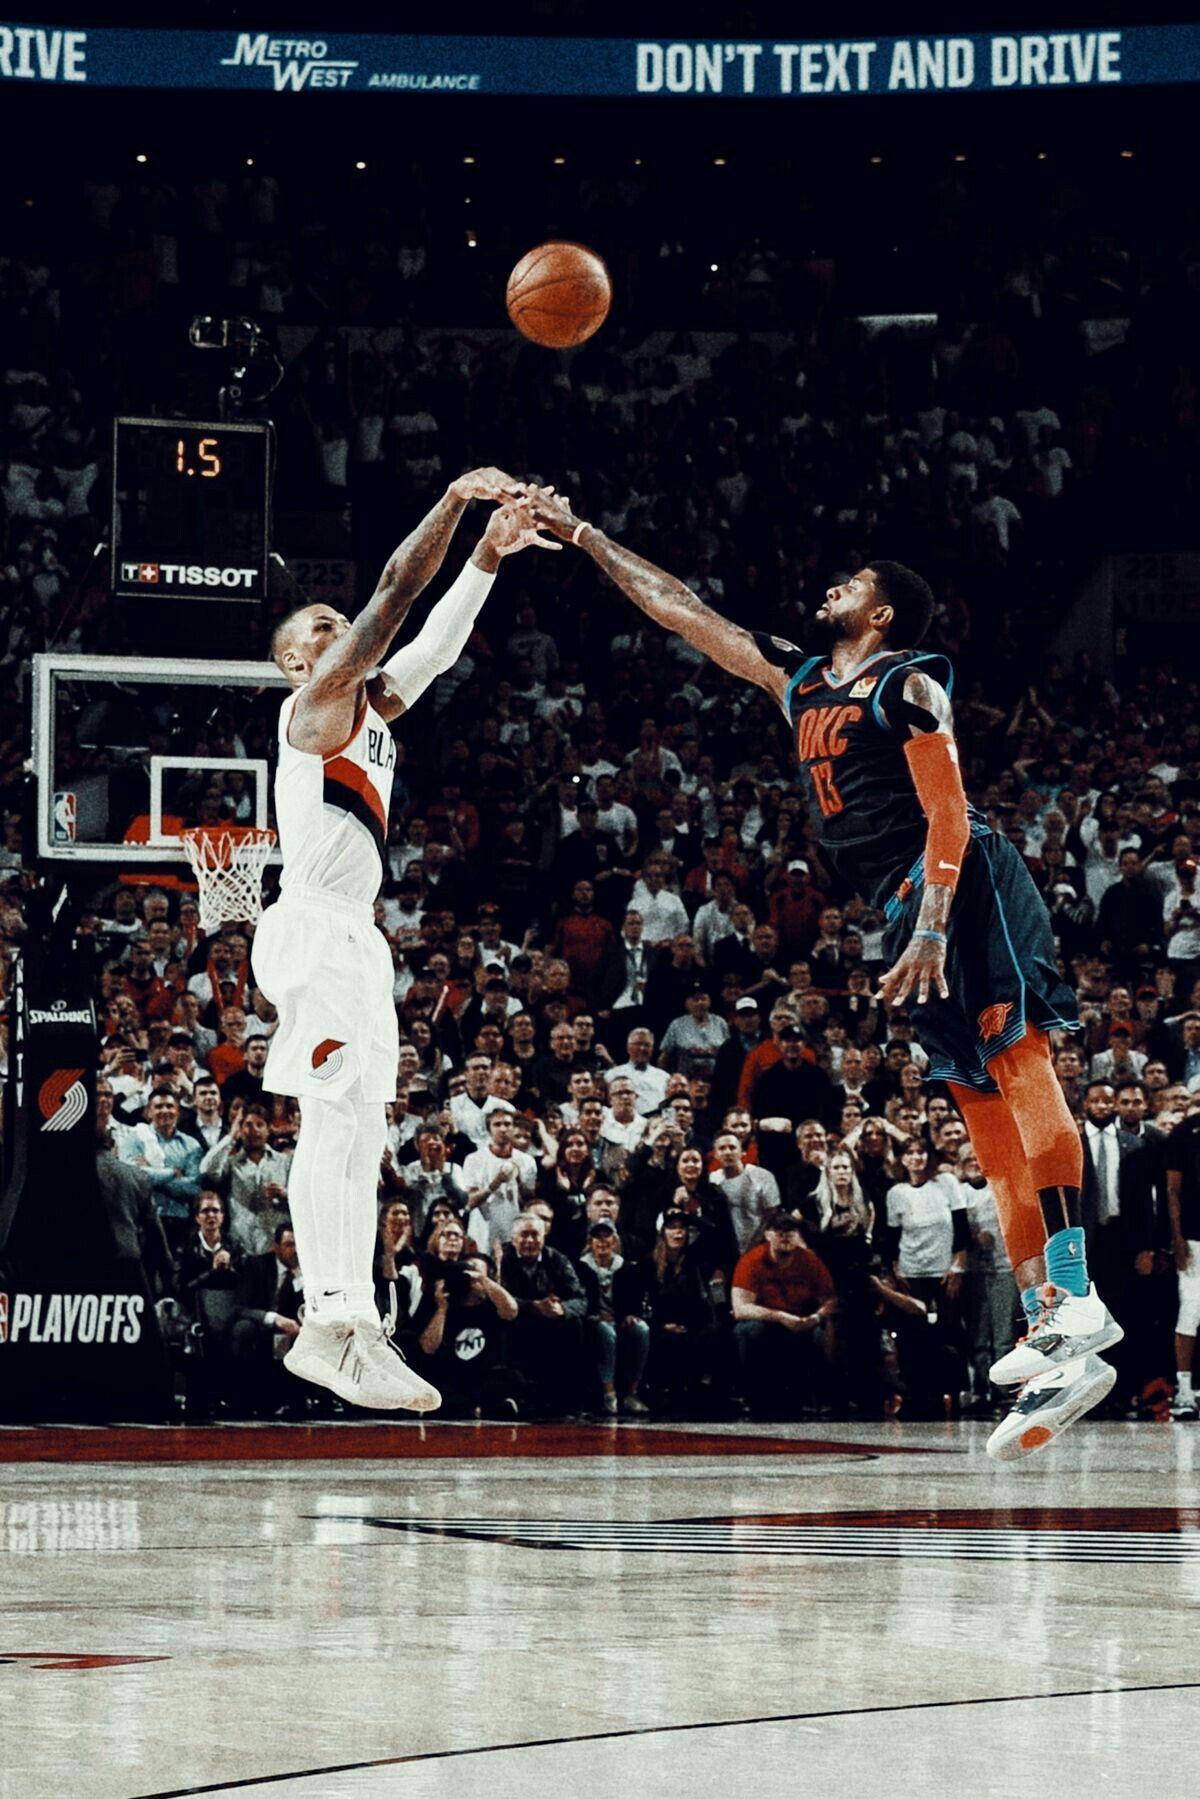 Pin By Neo Matrix On Fanatic Basketball Wallpaper Nba Wallpapers Nba Mvp